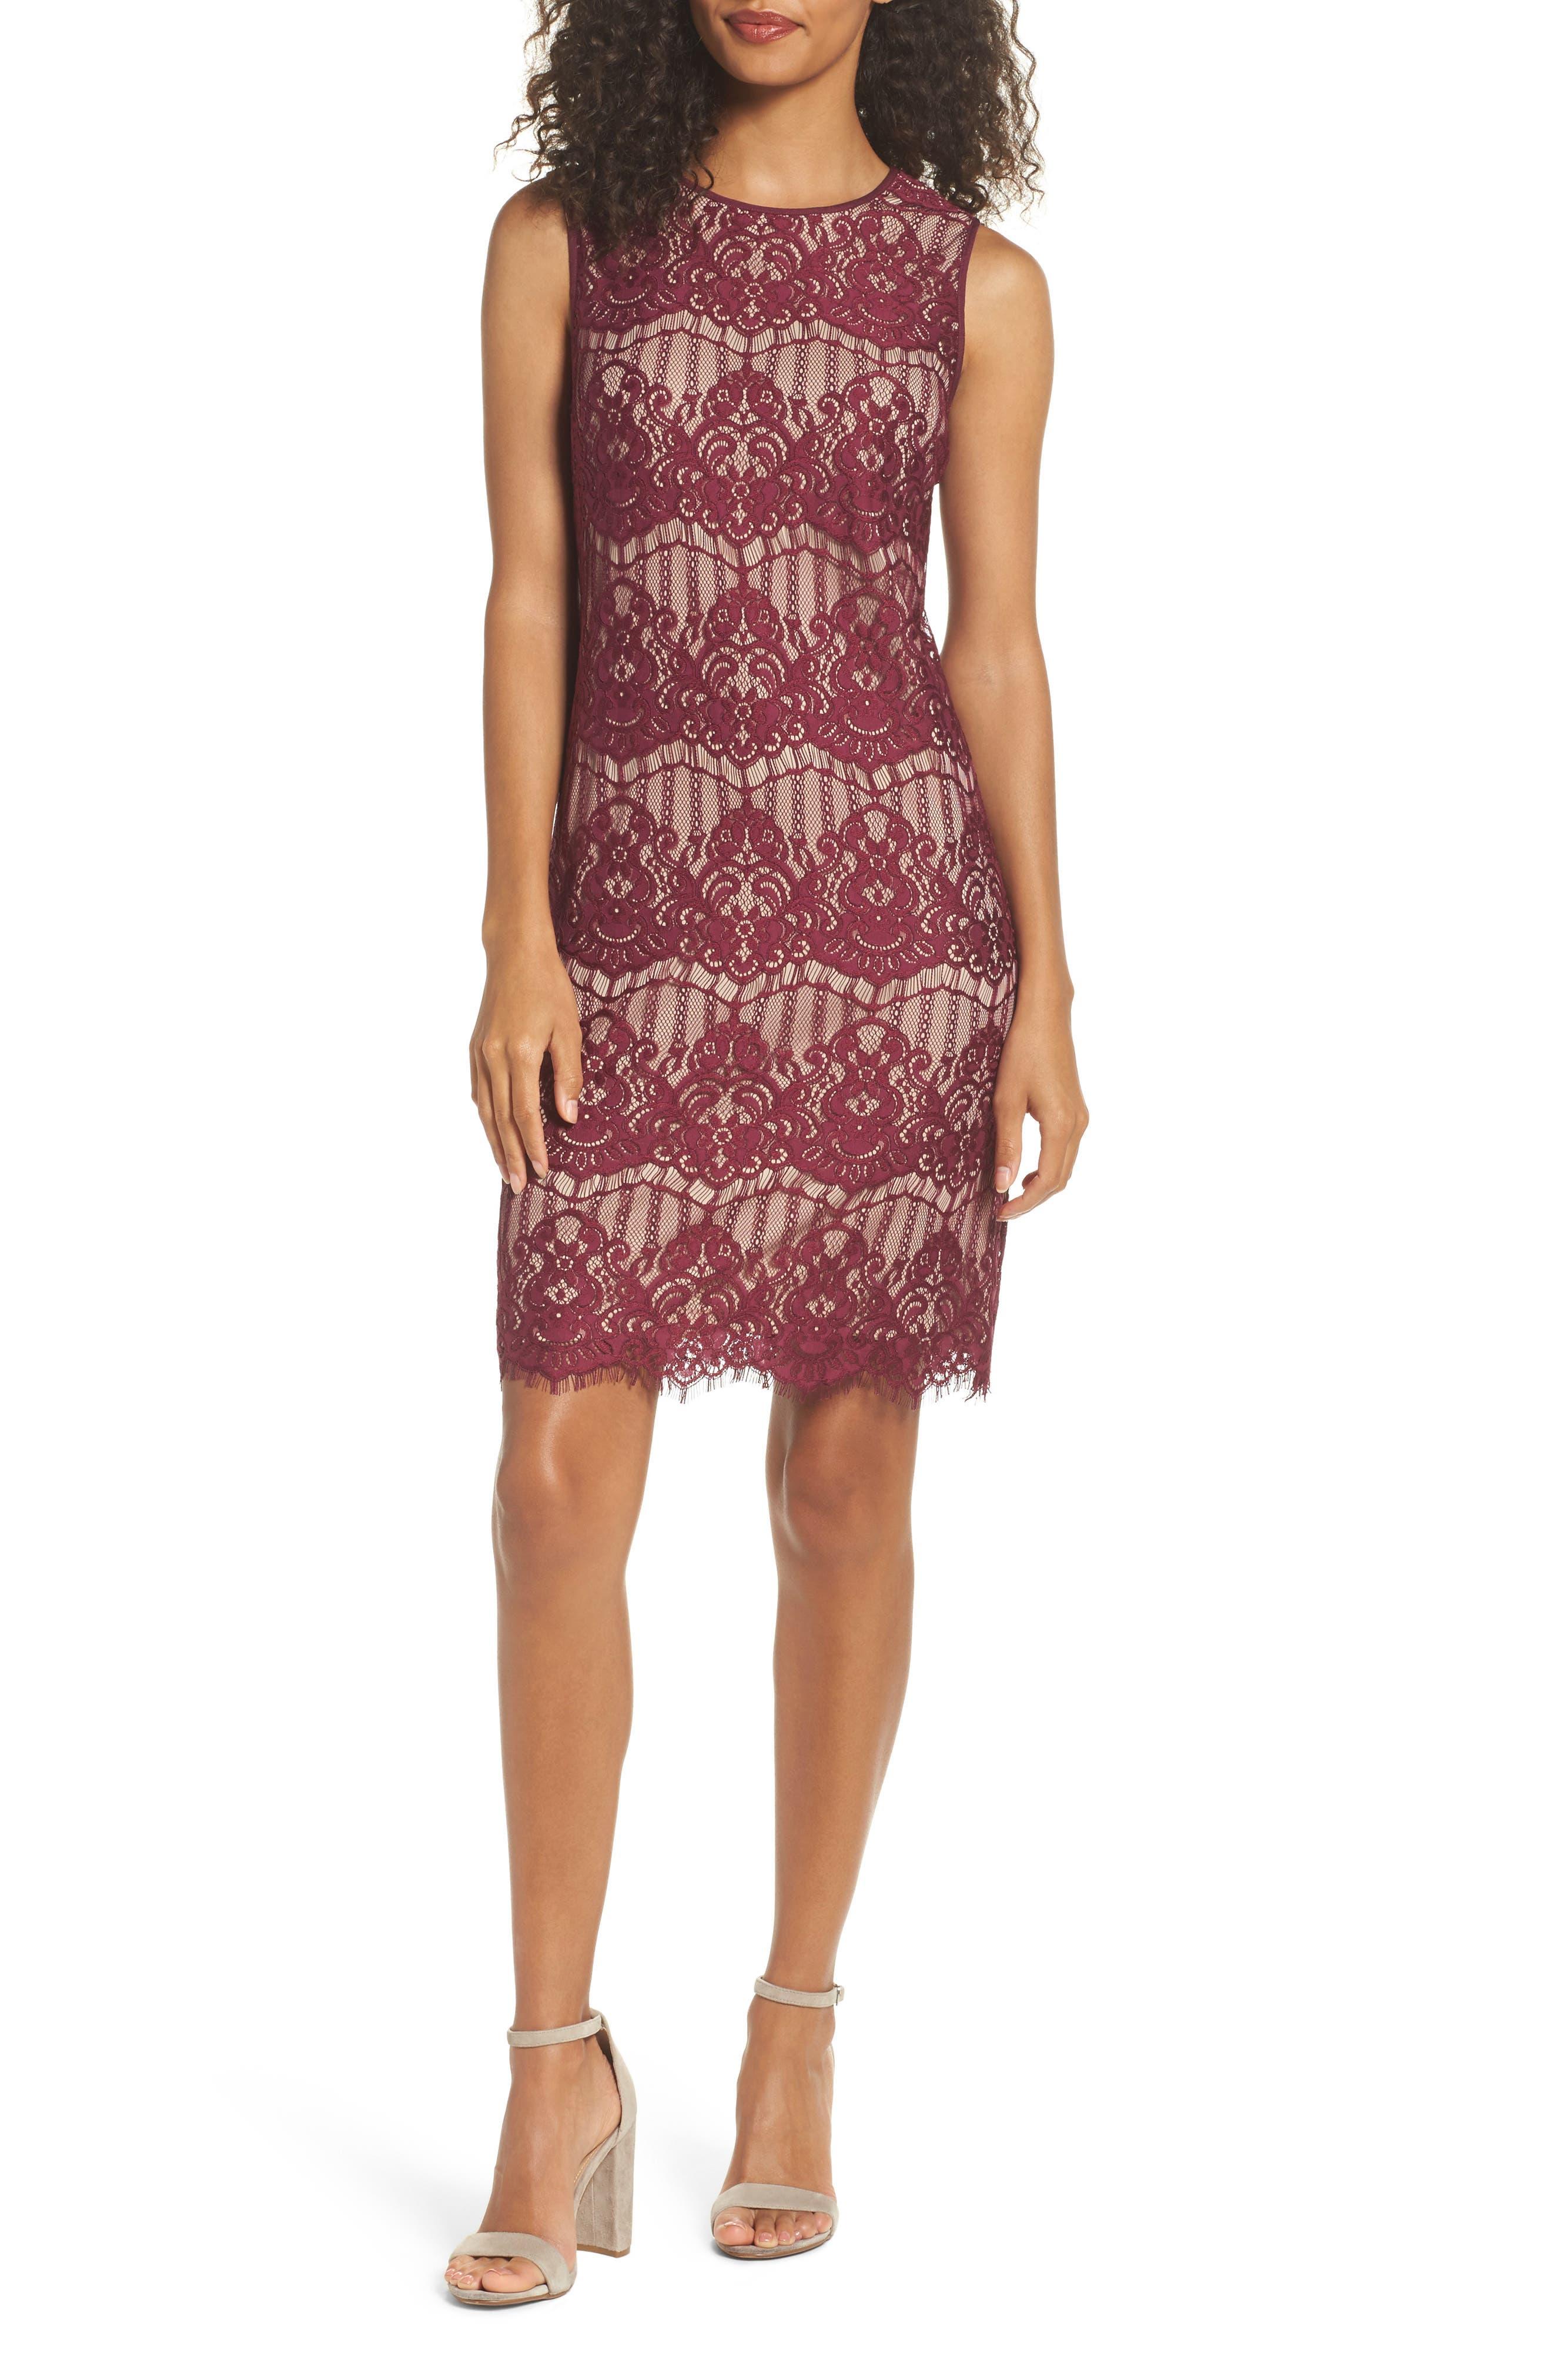 Scalloped Lace Sheath Dress,                             Main thumbnail 1, color,                             640